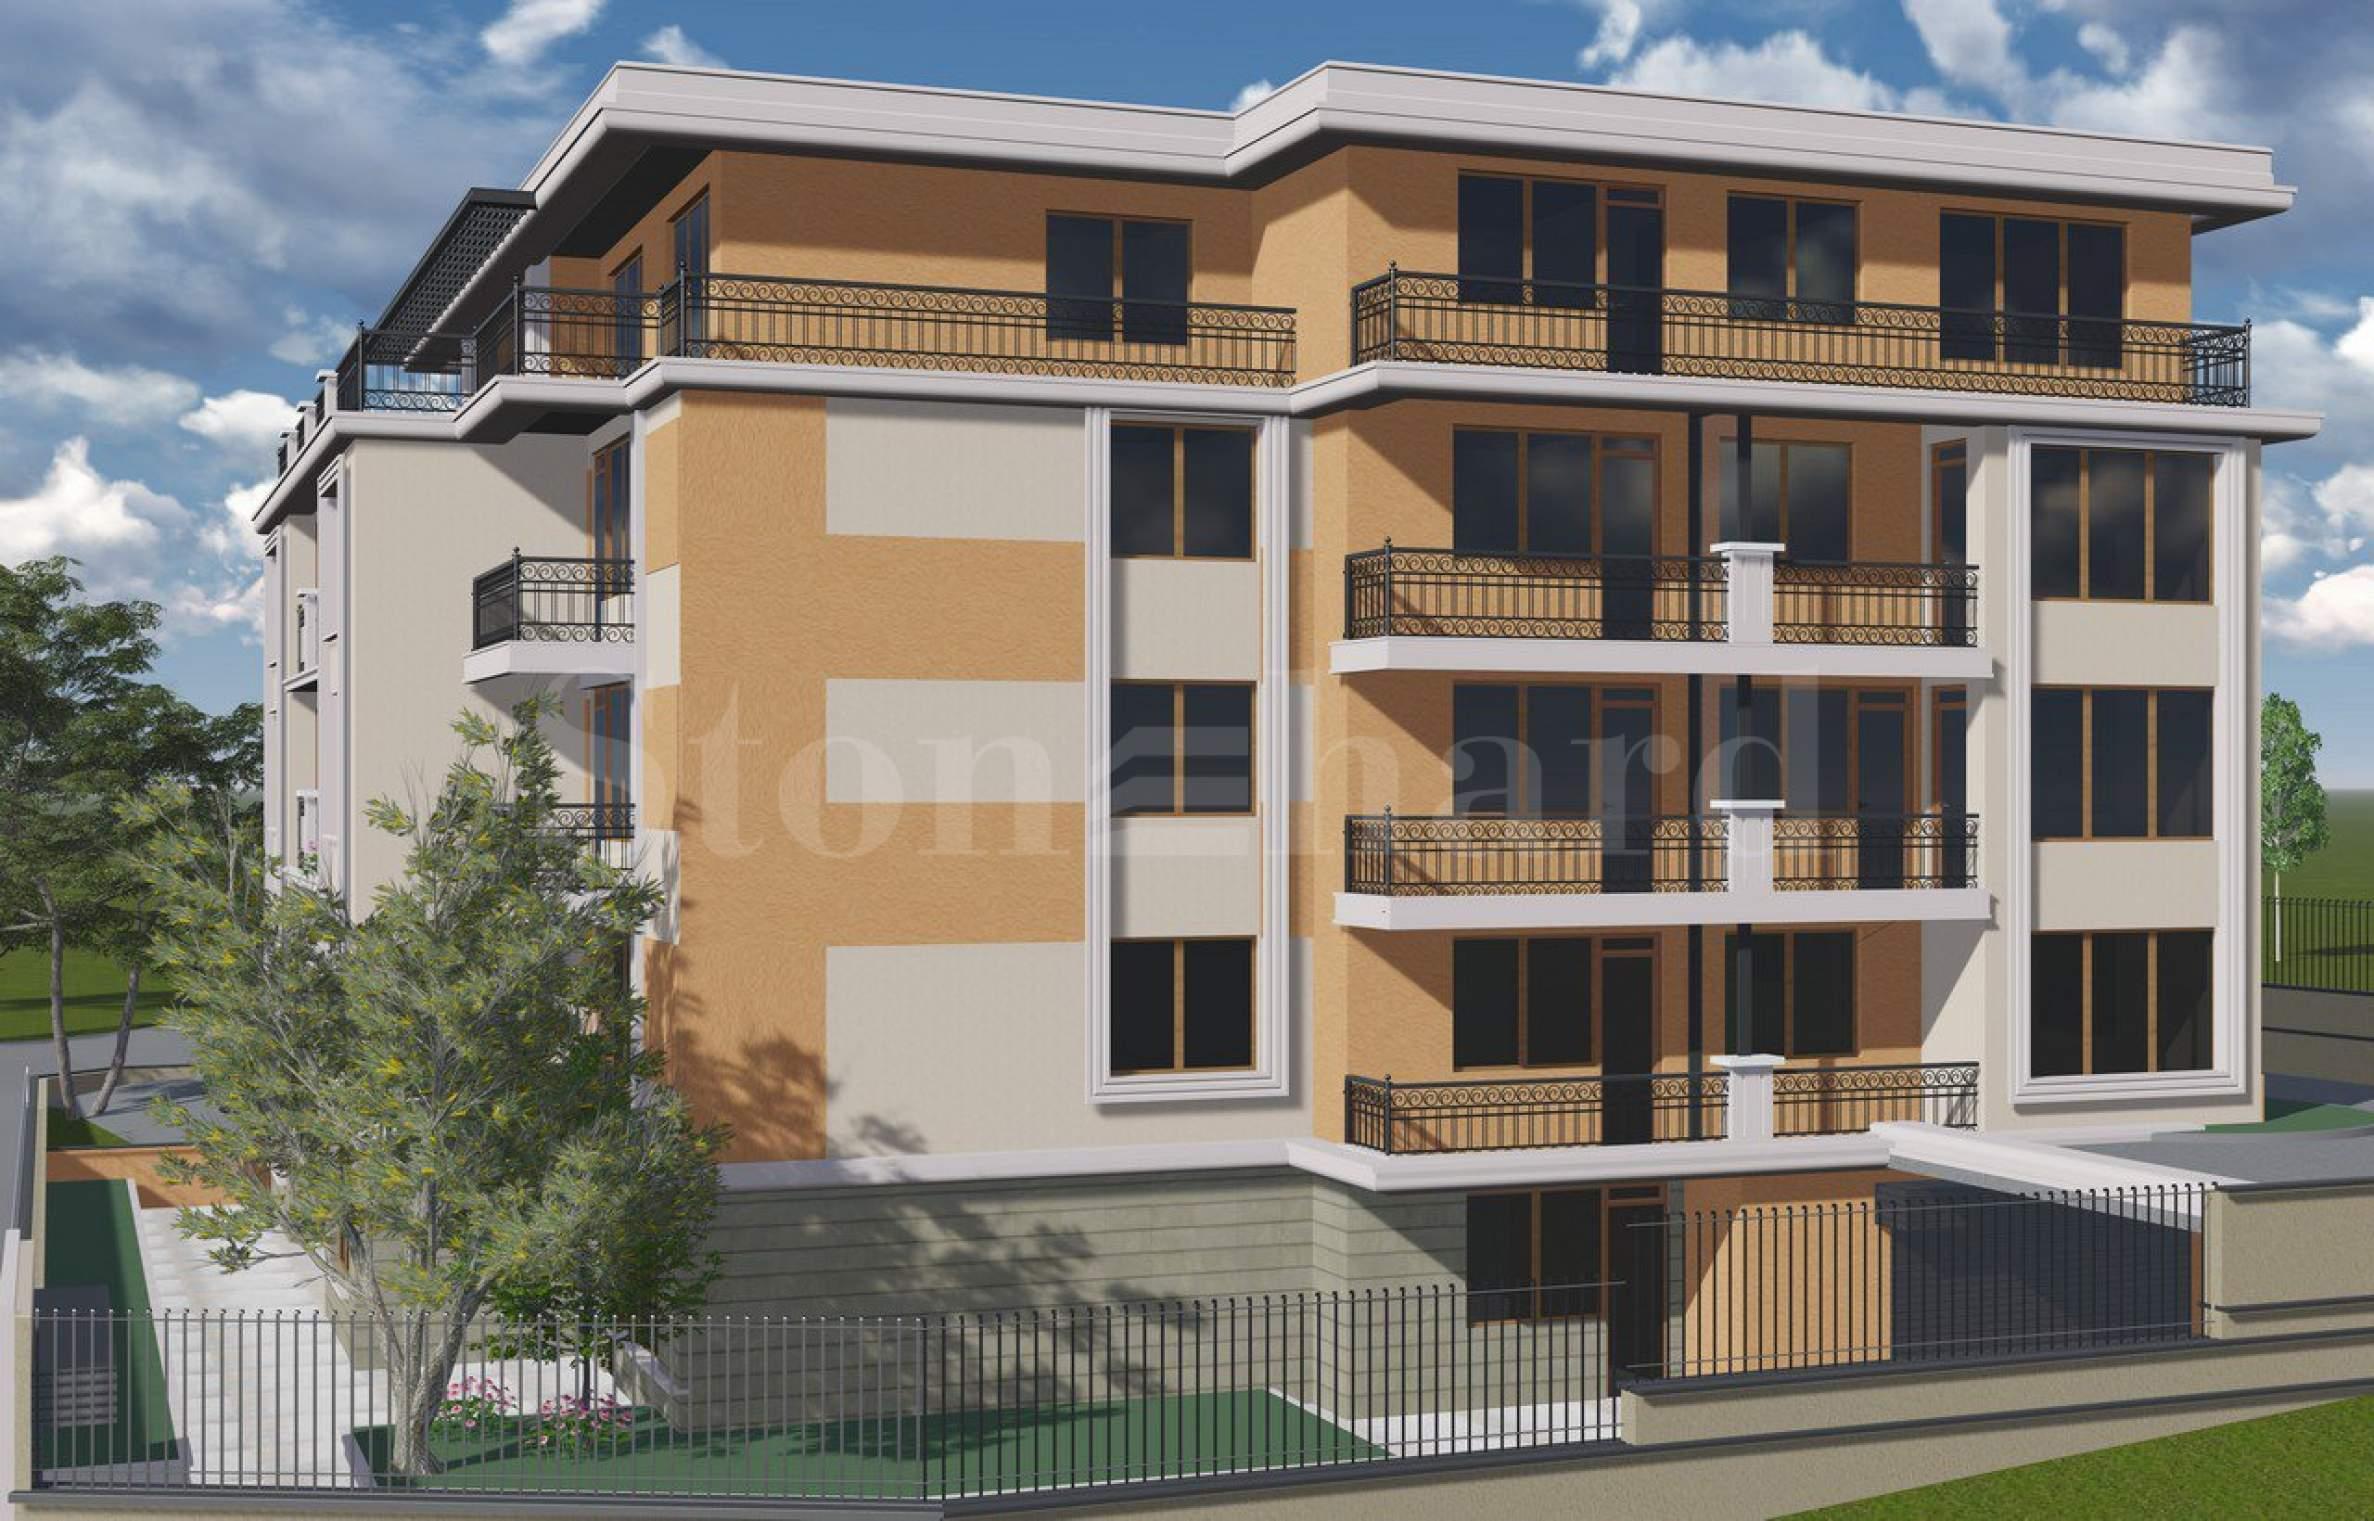 New studios and apartments near oak forest2 - Stonehard